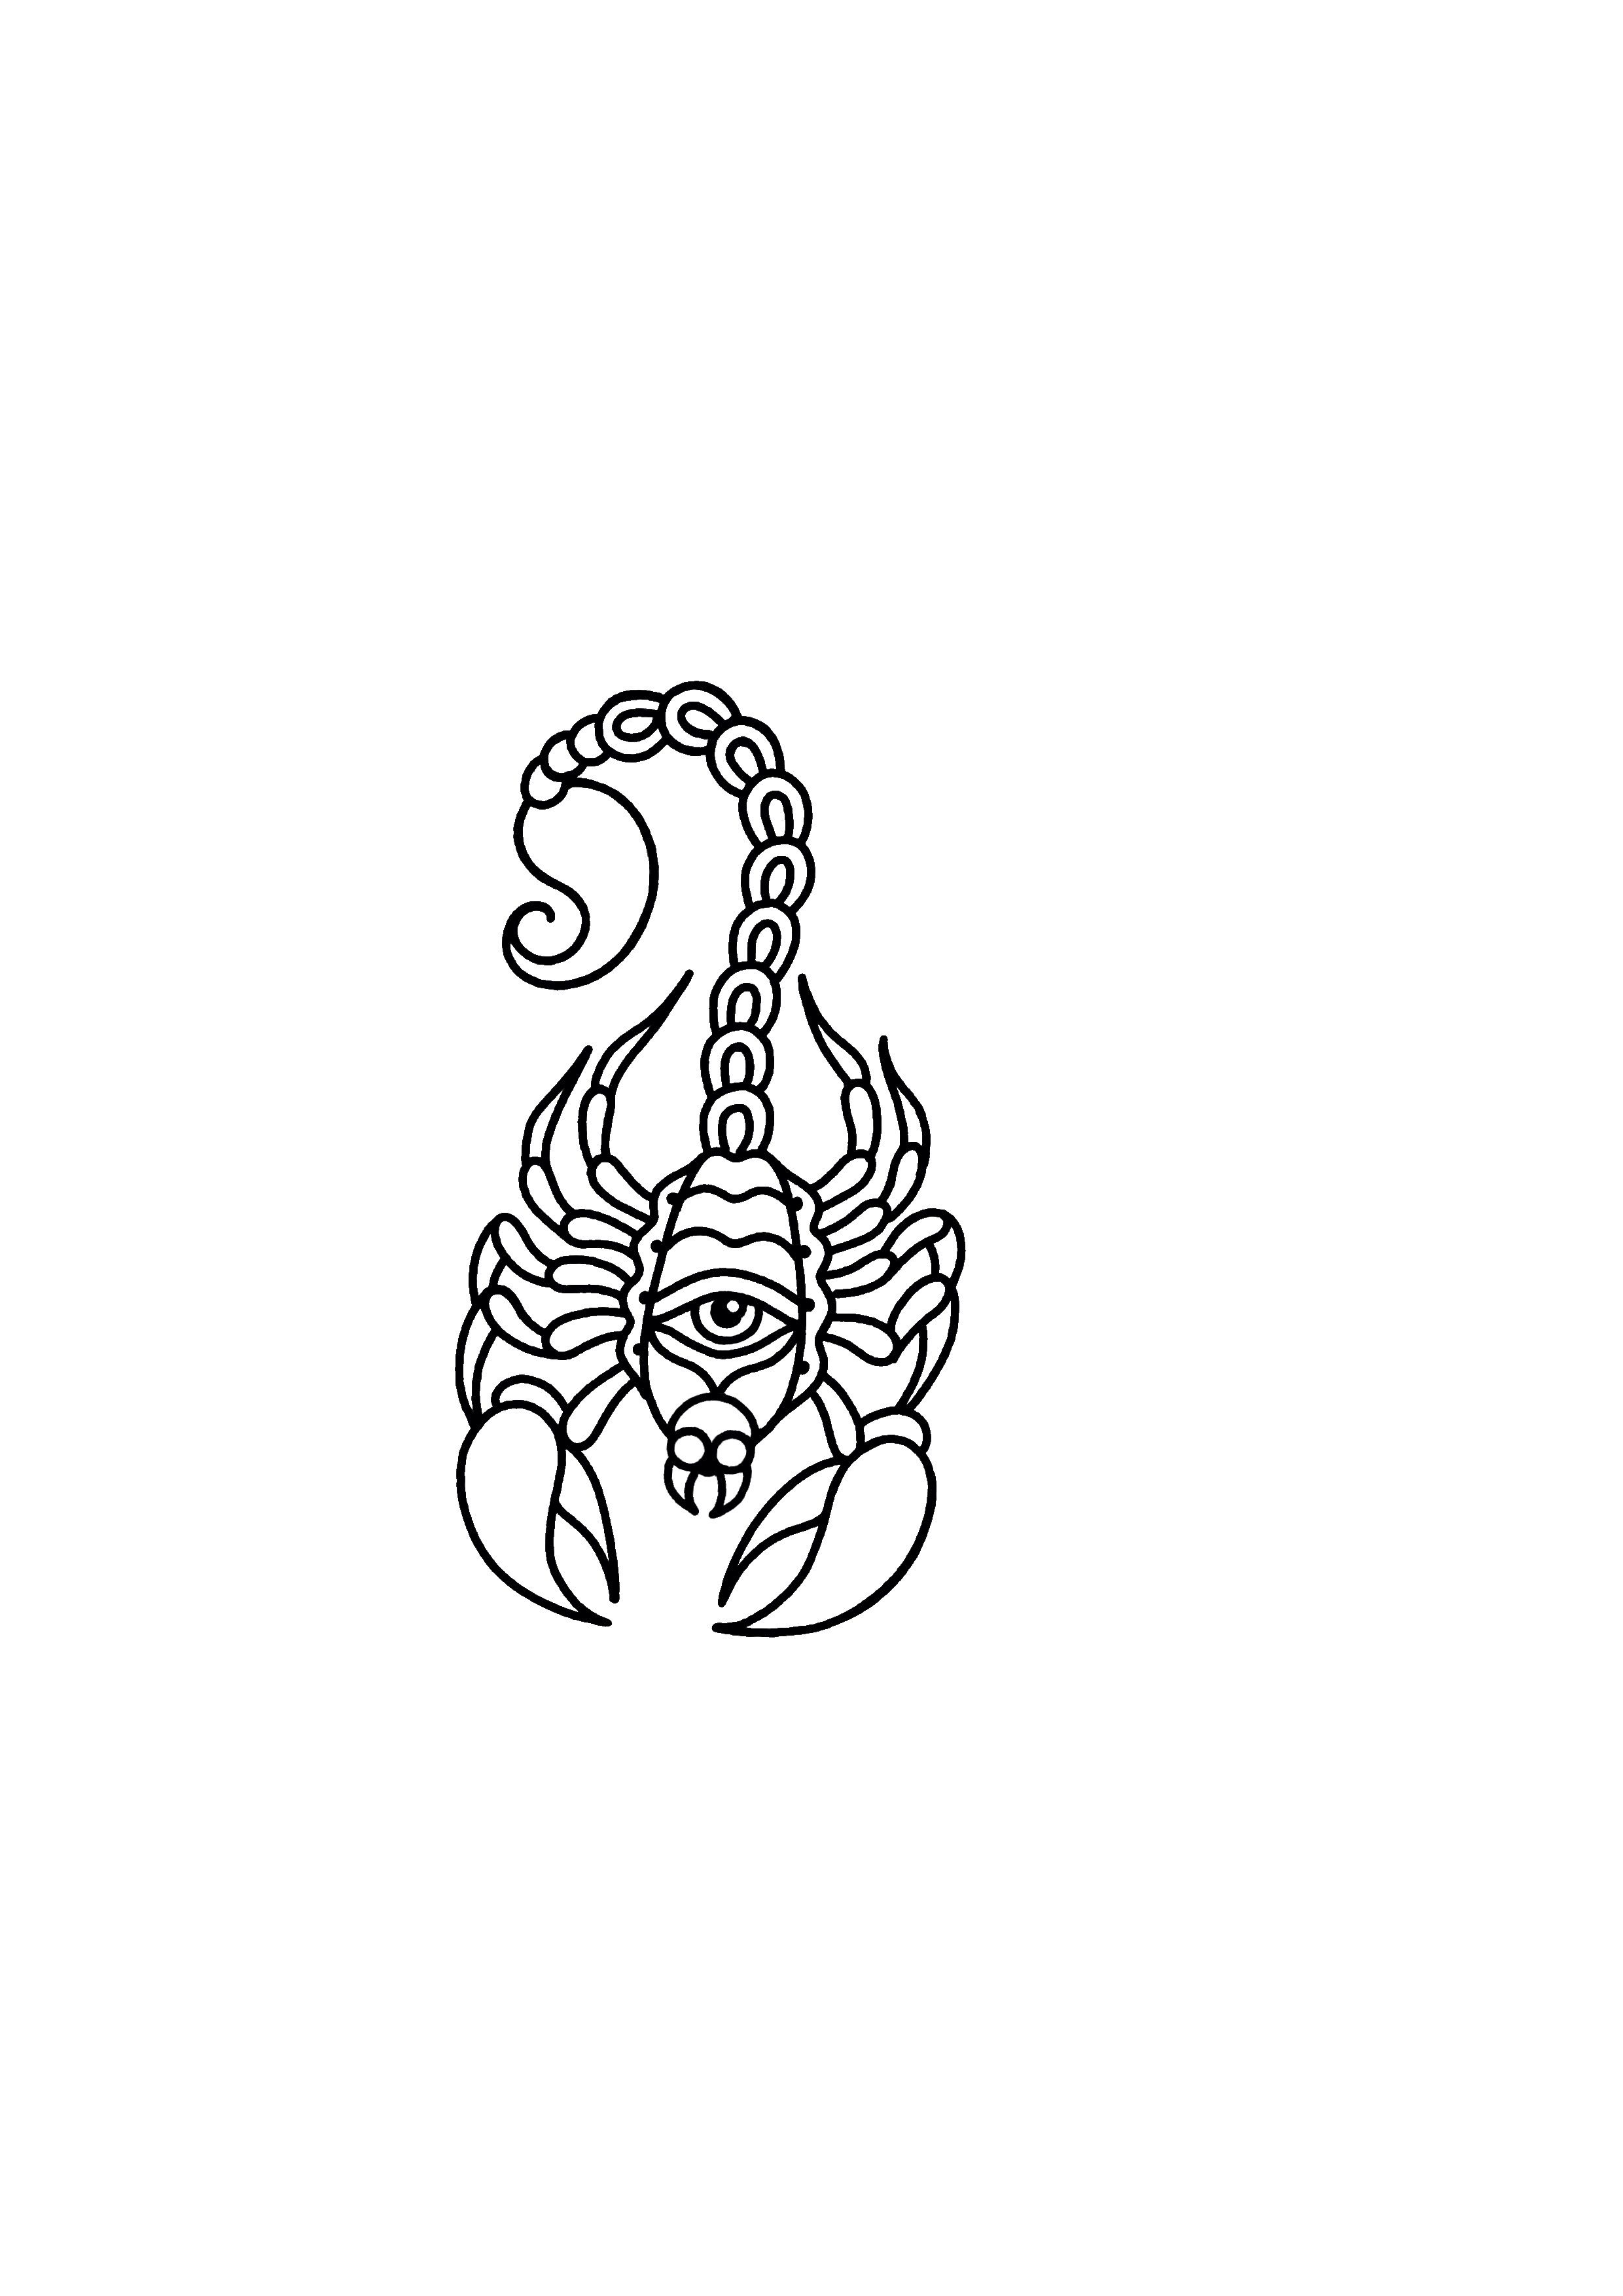 Bocetos De Tatuajes Tradicionales pin de mauricio sierra en tattos | tatuajes tradicionales